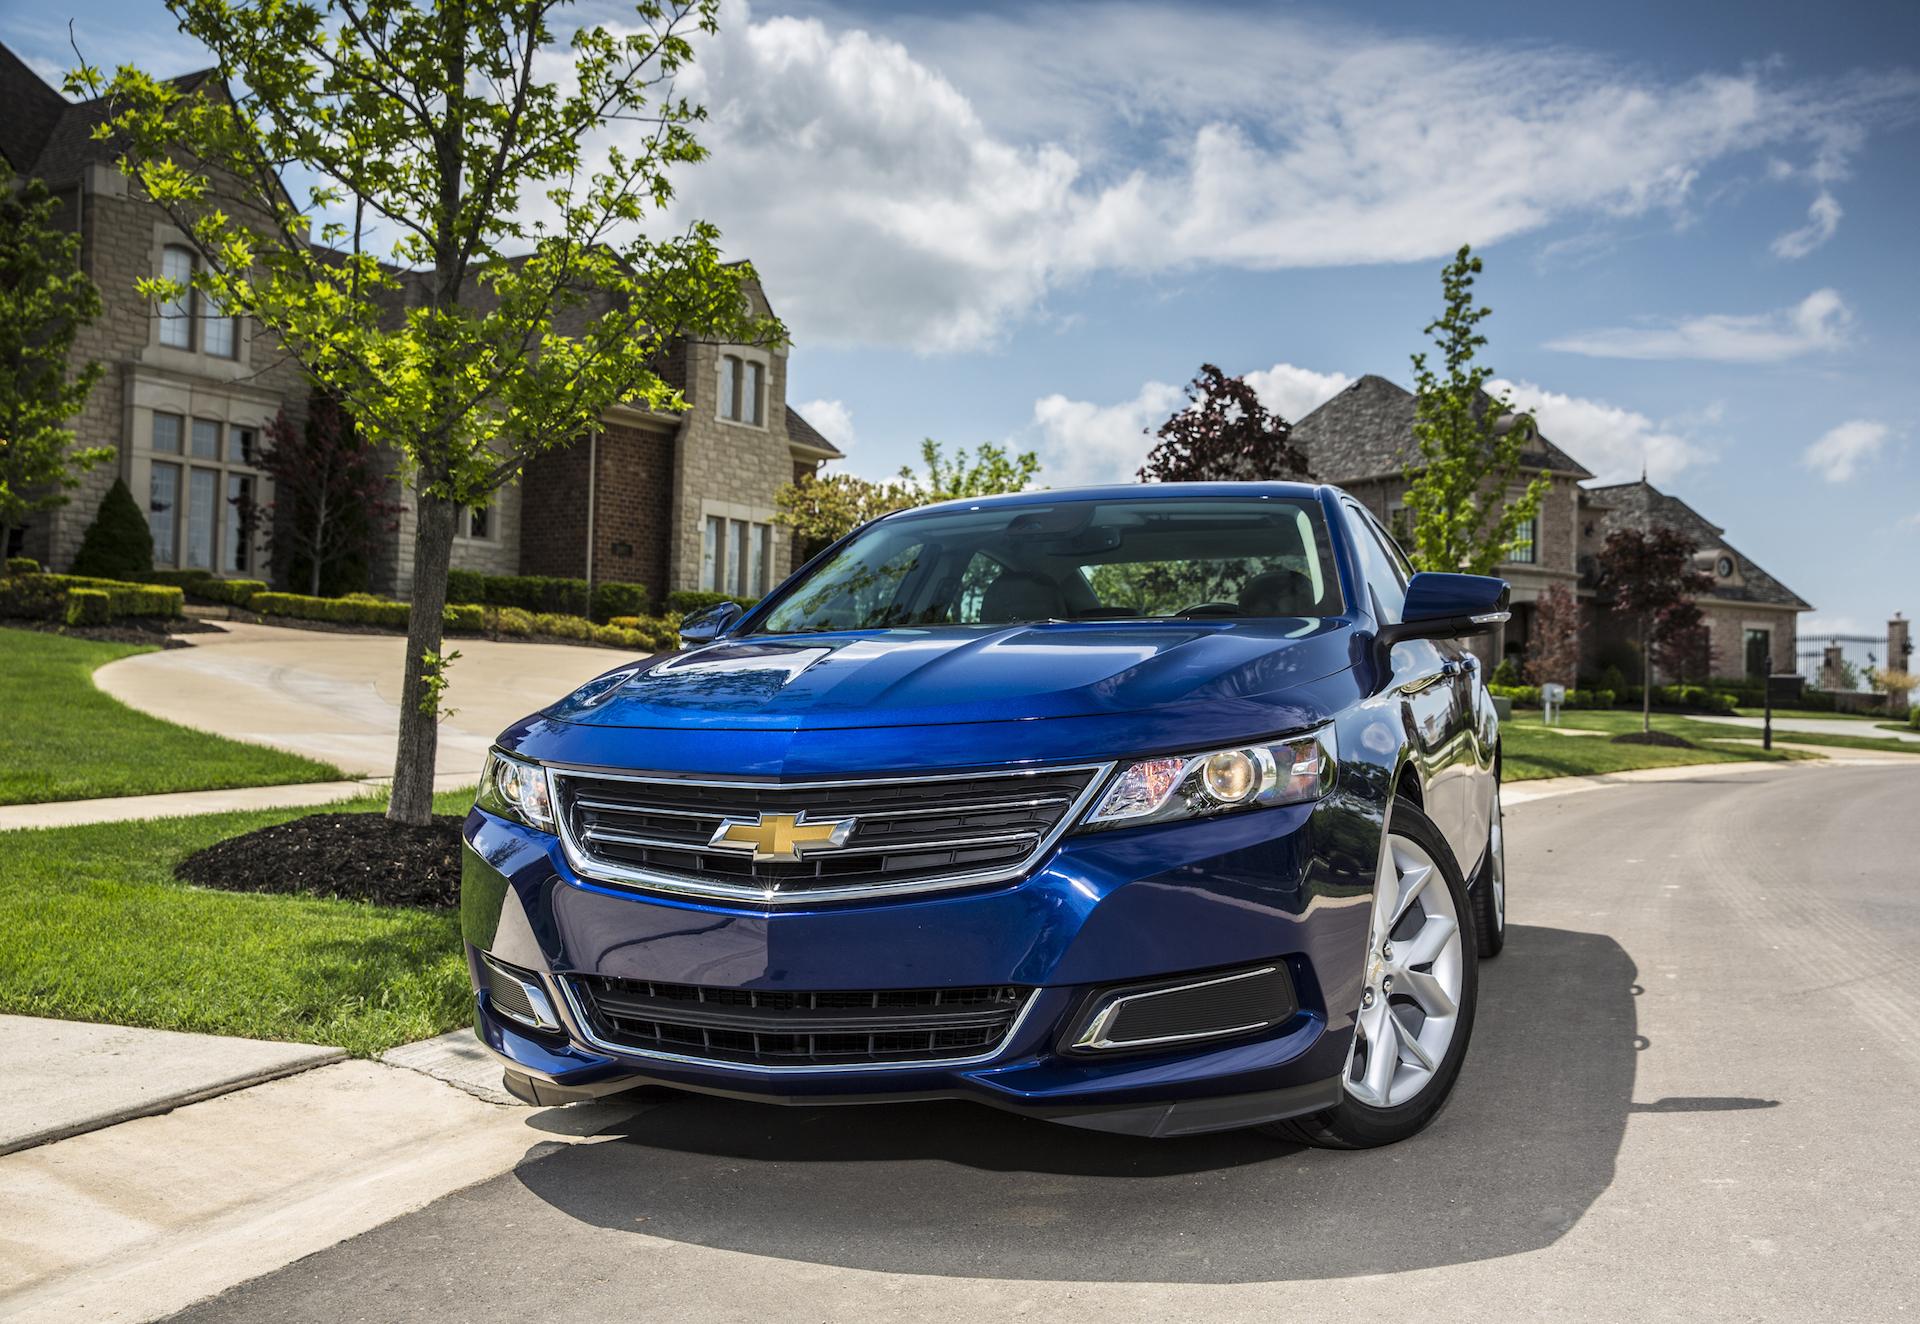 2016 Chevrolet Impala Blue Front Design